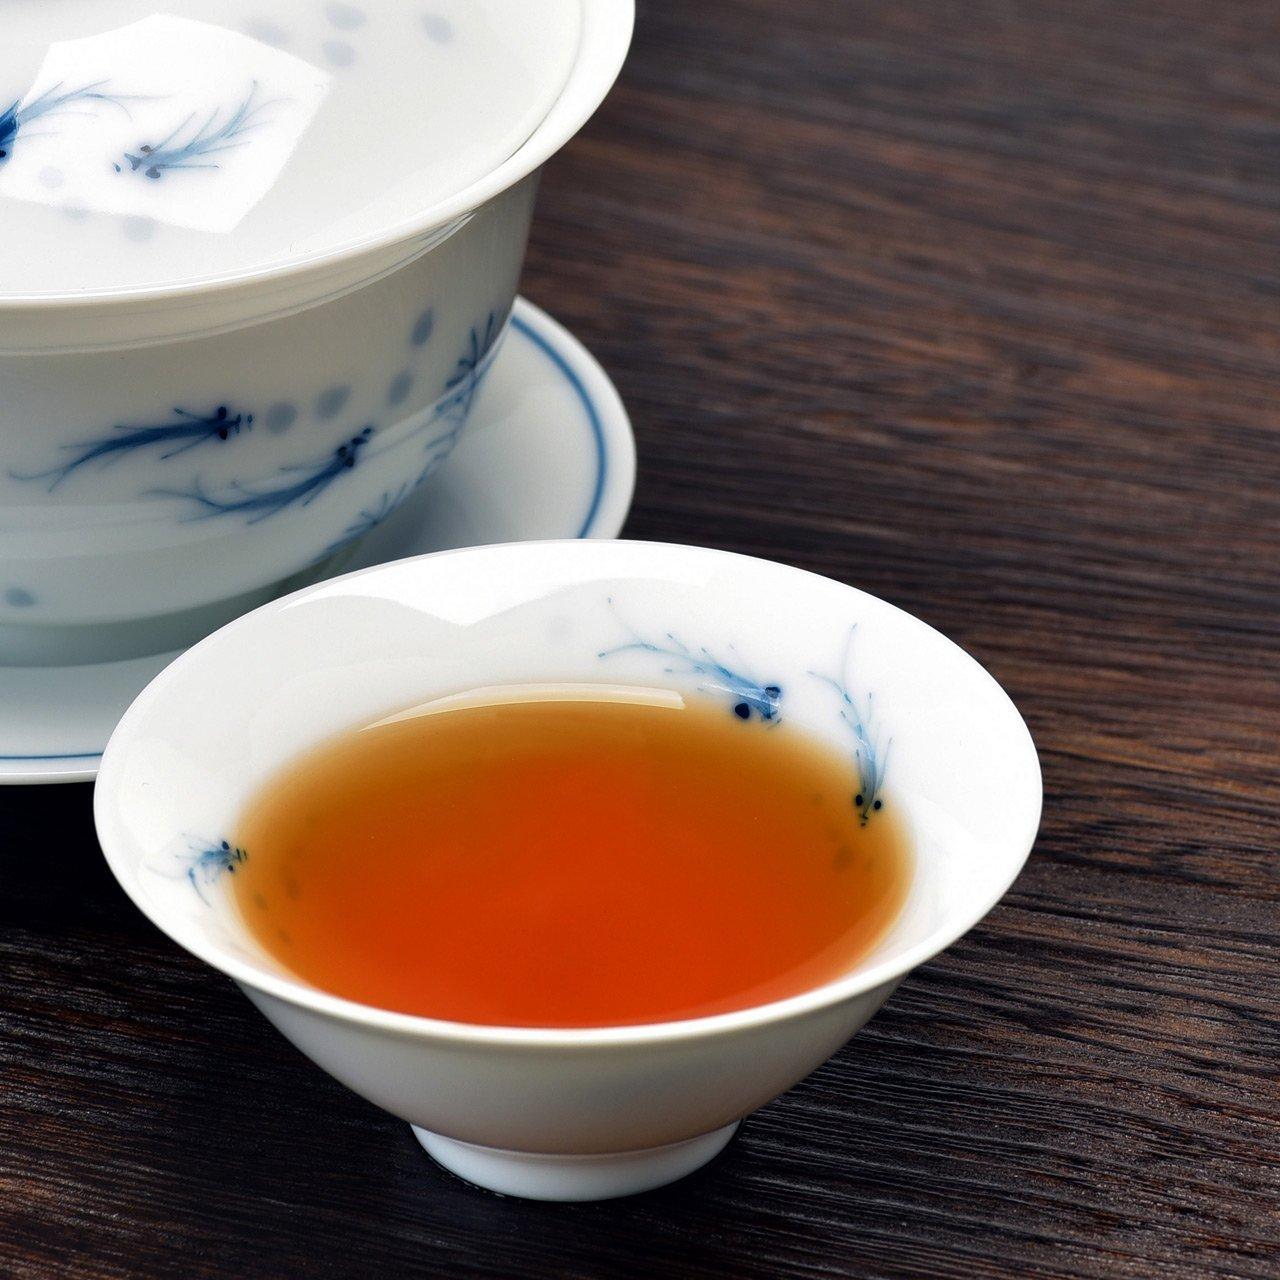 Teavivre Organic Lapsang Souchong Smoky Black Tea Loose Leaf Chinese Tea (3.5oz / 100g)